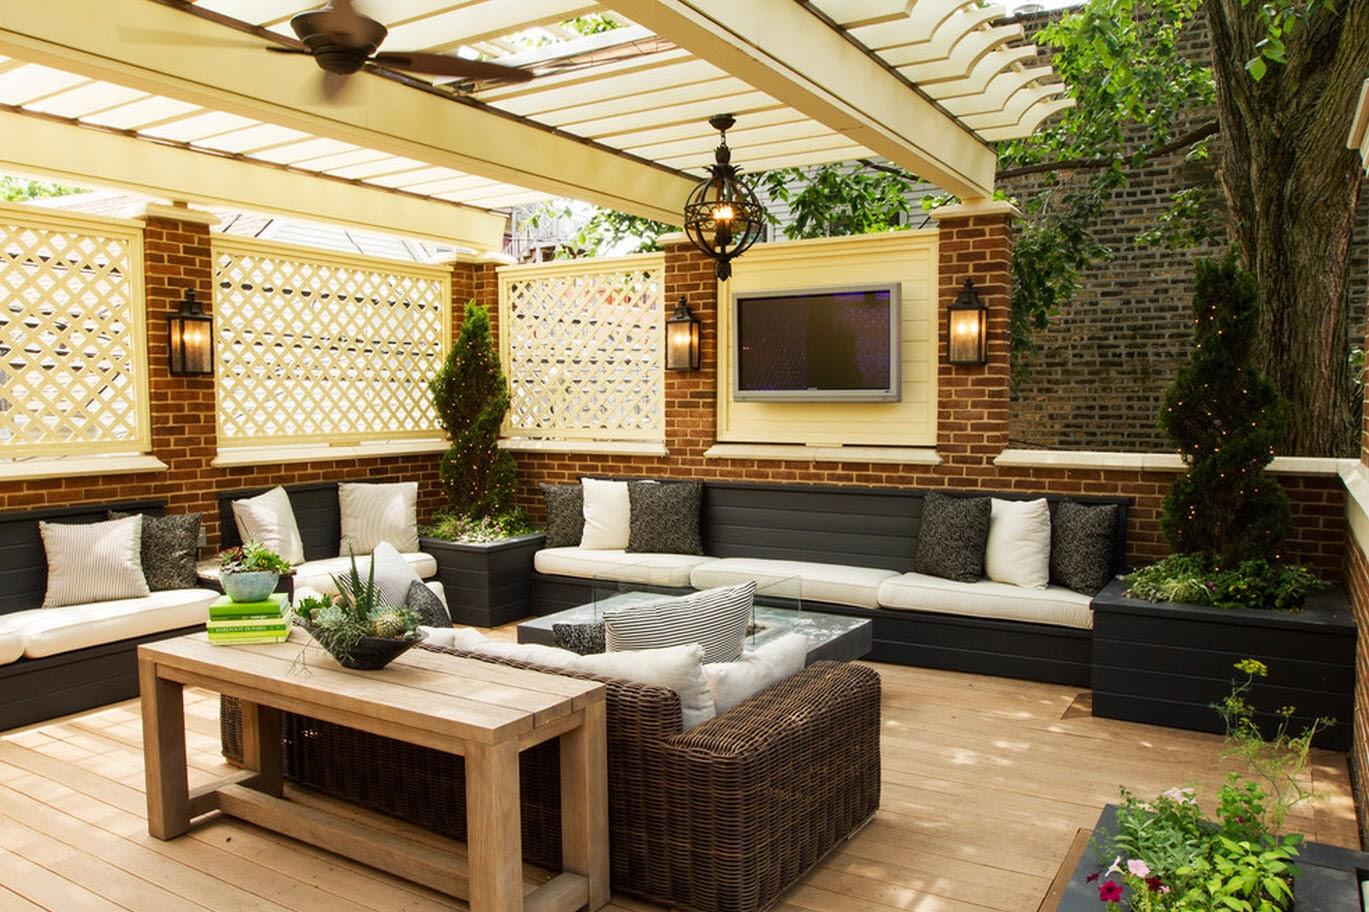 10 ideas para dise ar terraza para relax for Muebles para terraza y jardin